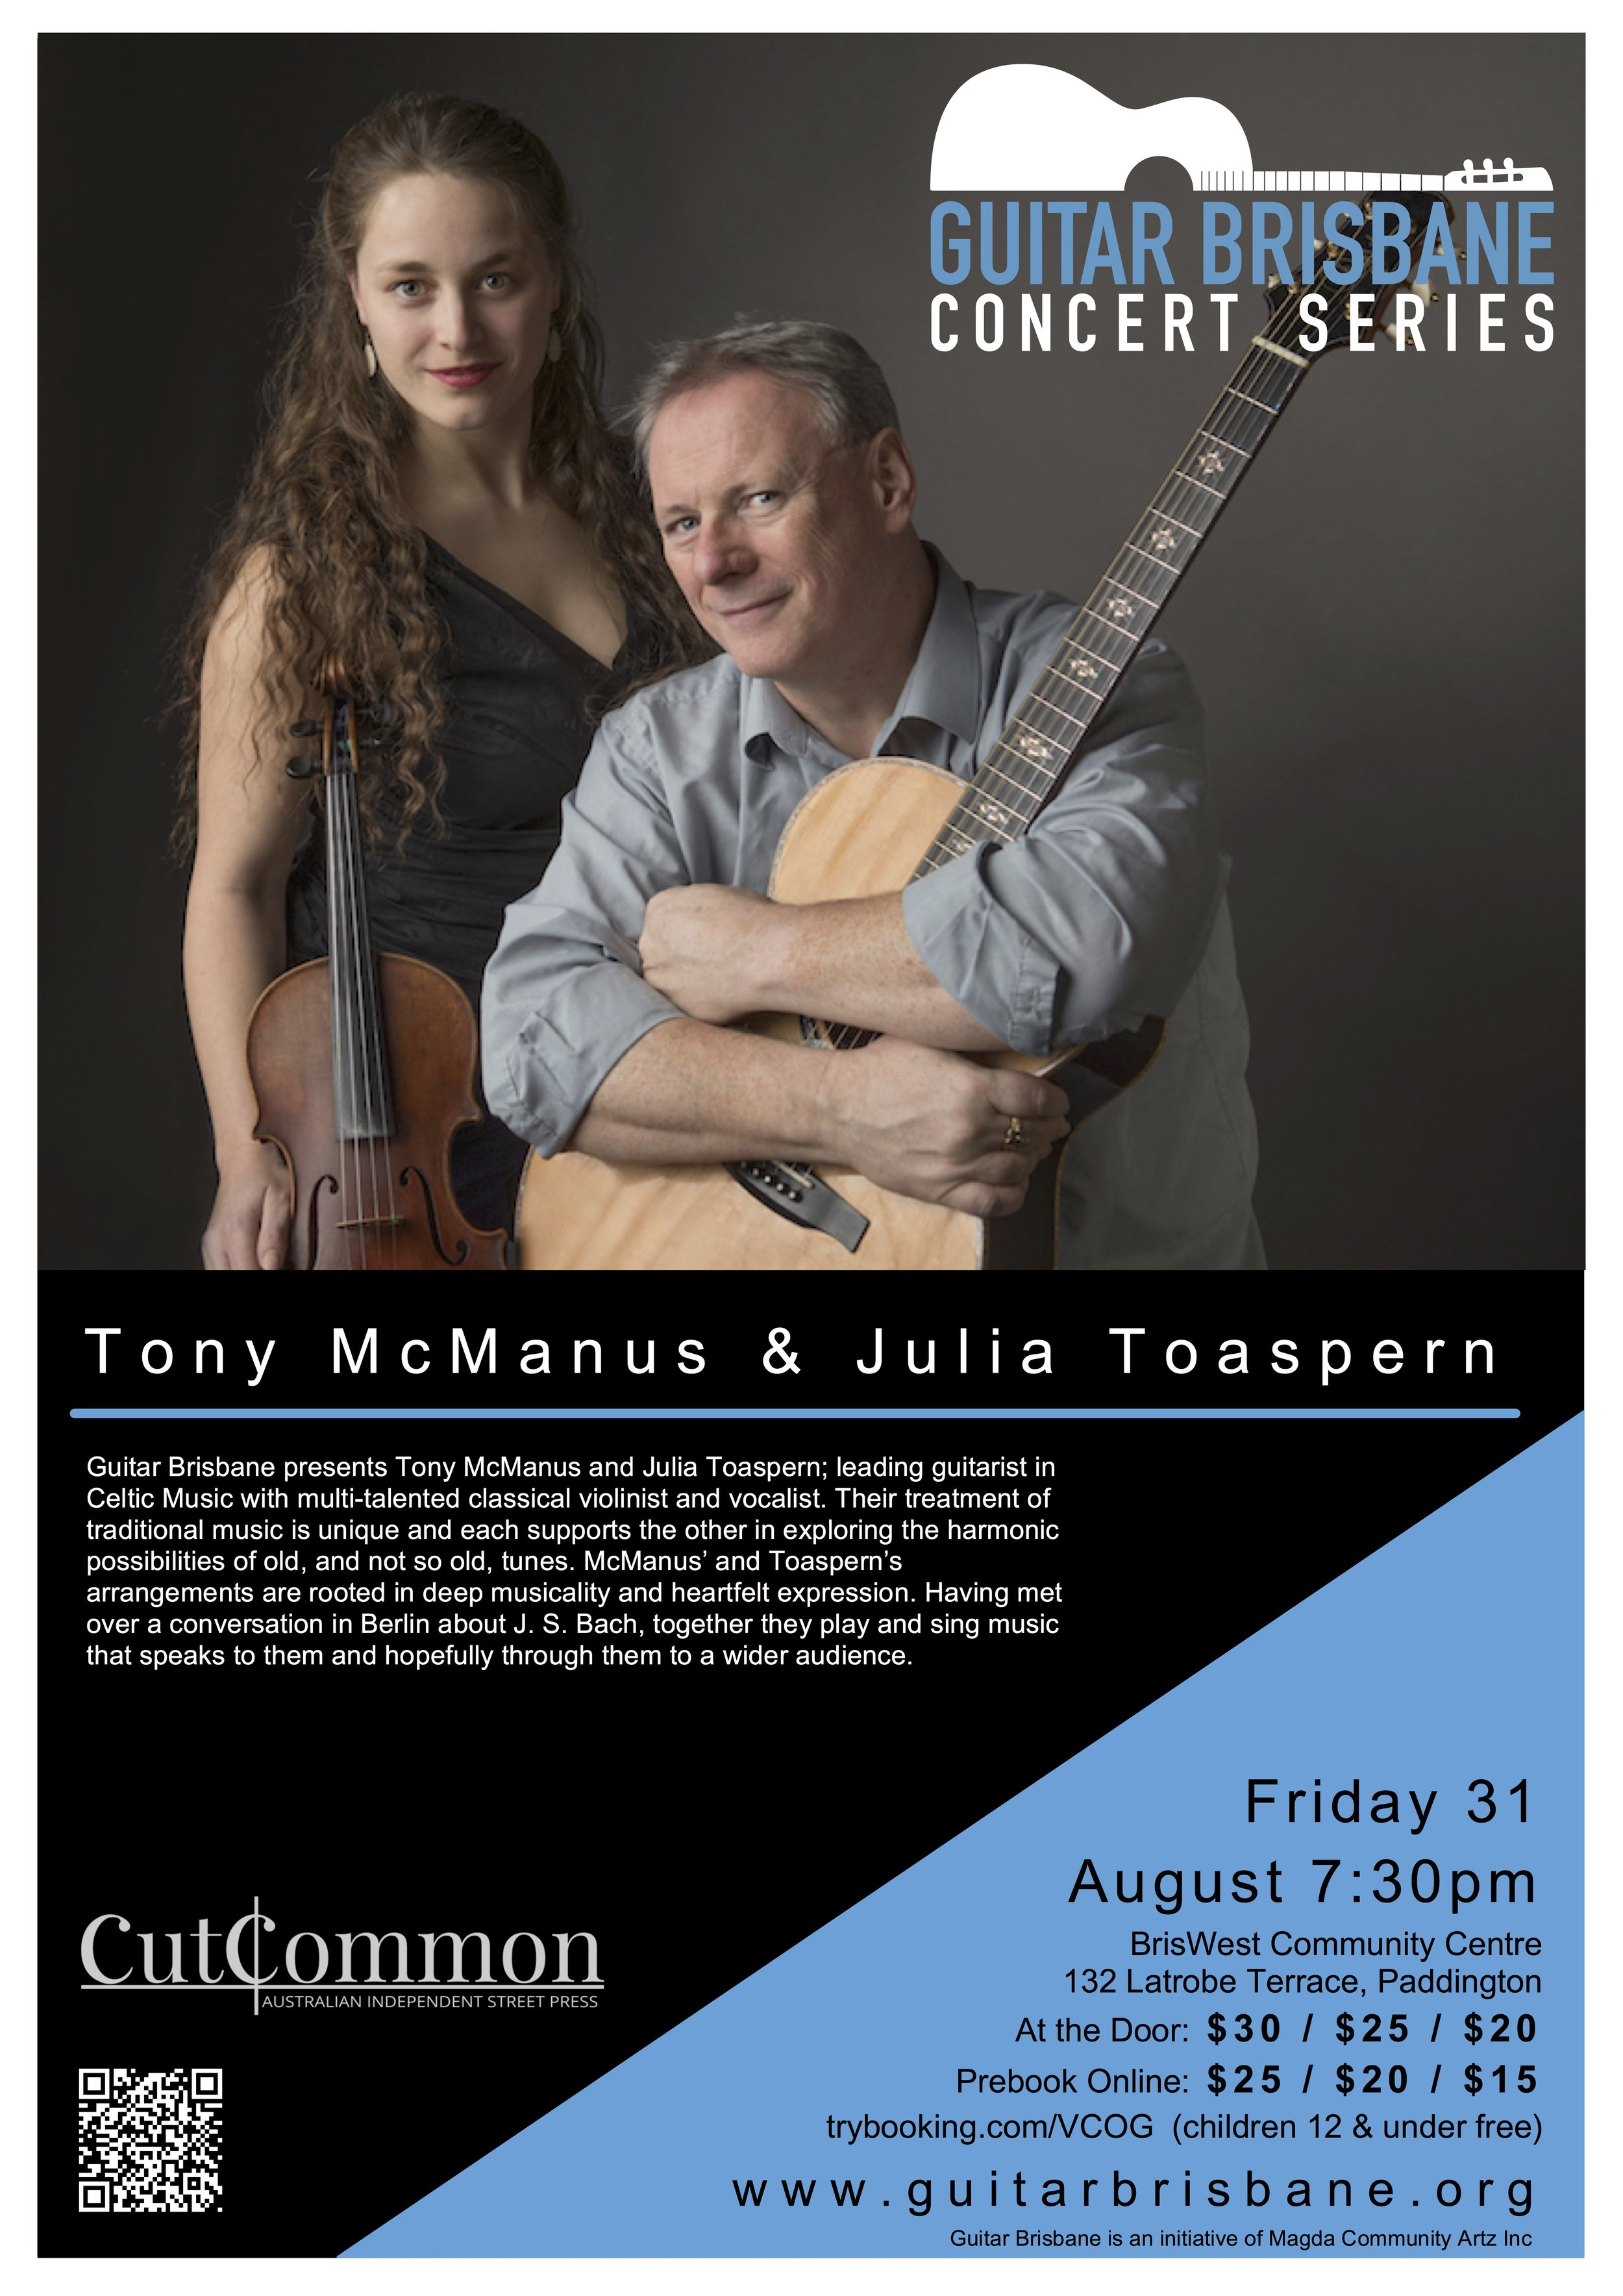 Tony McManus & Julia Toaspern A3 poster.jpg